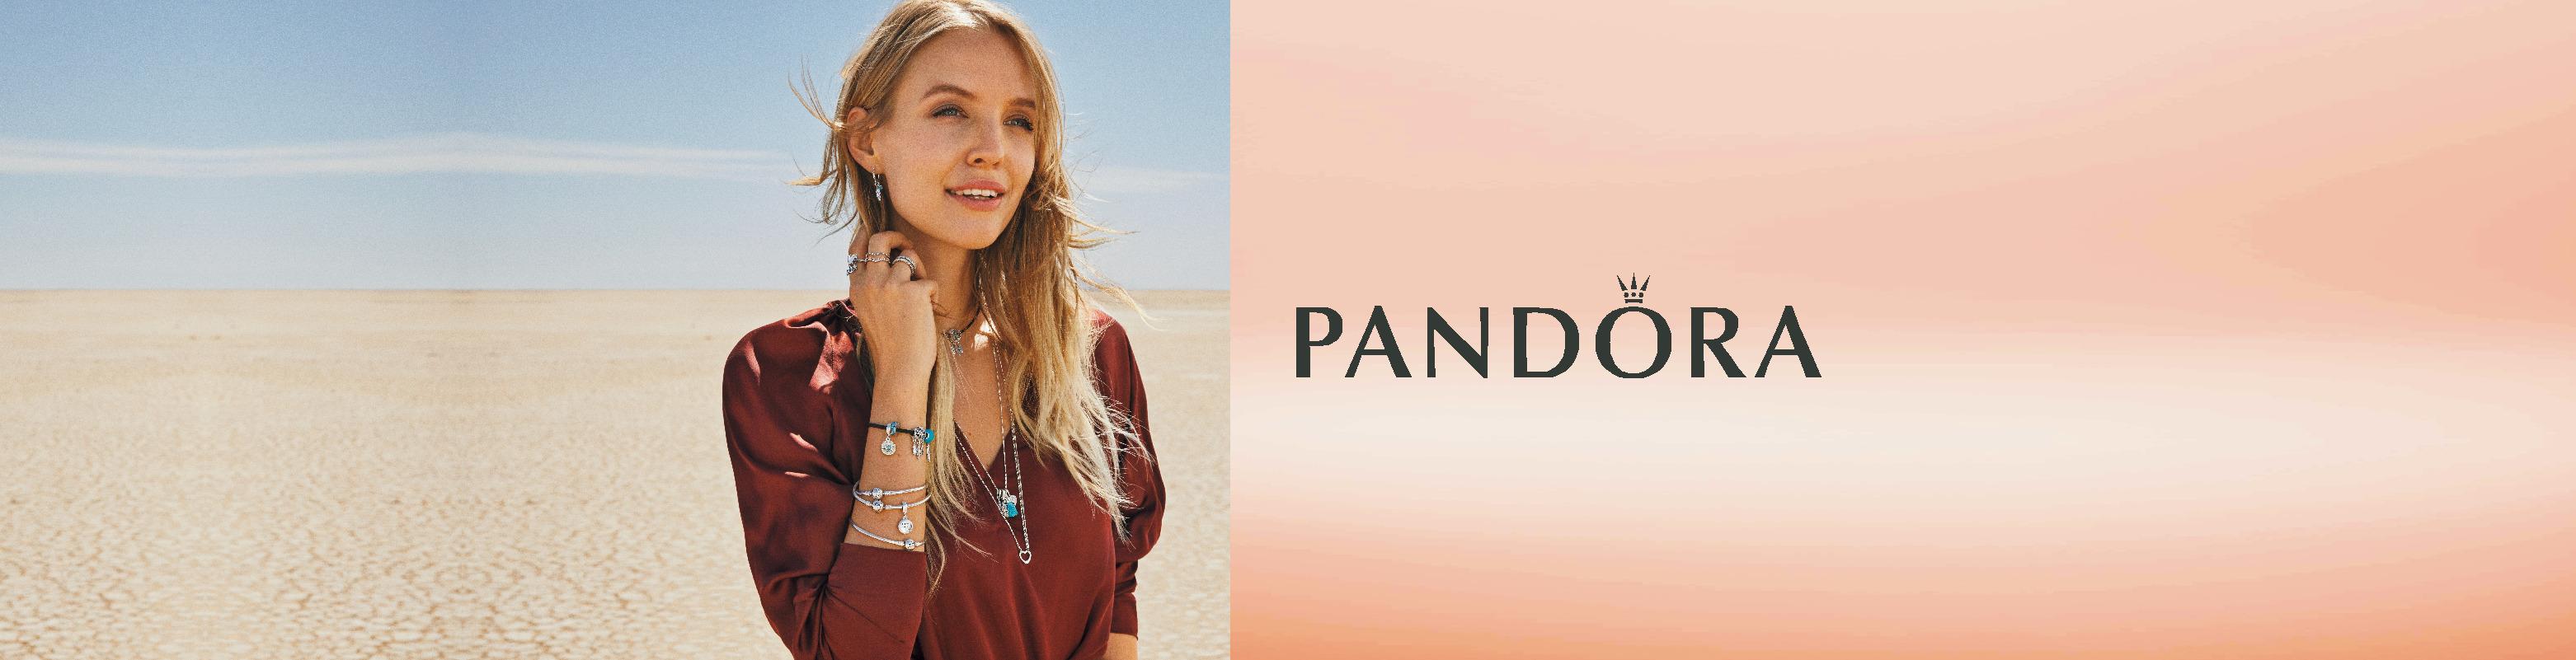 PANDORA Homepage Banner